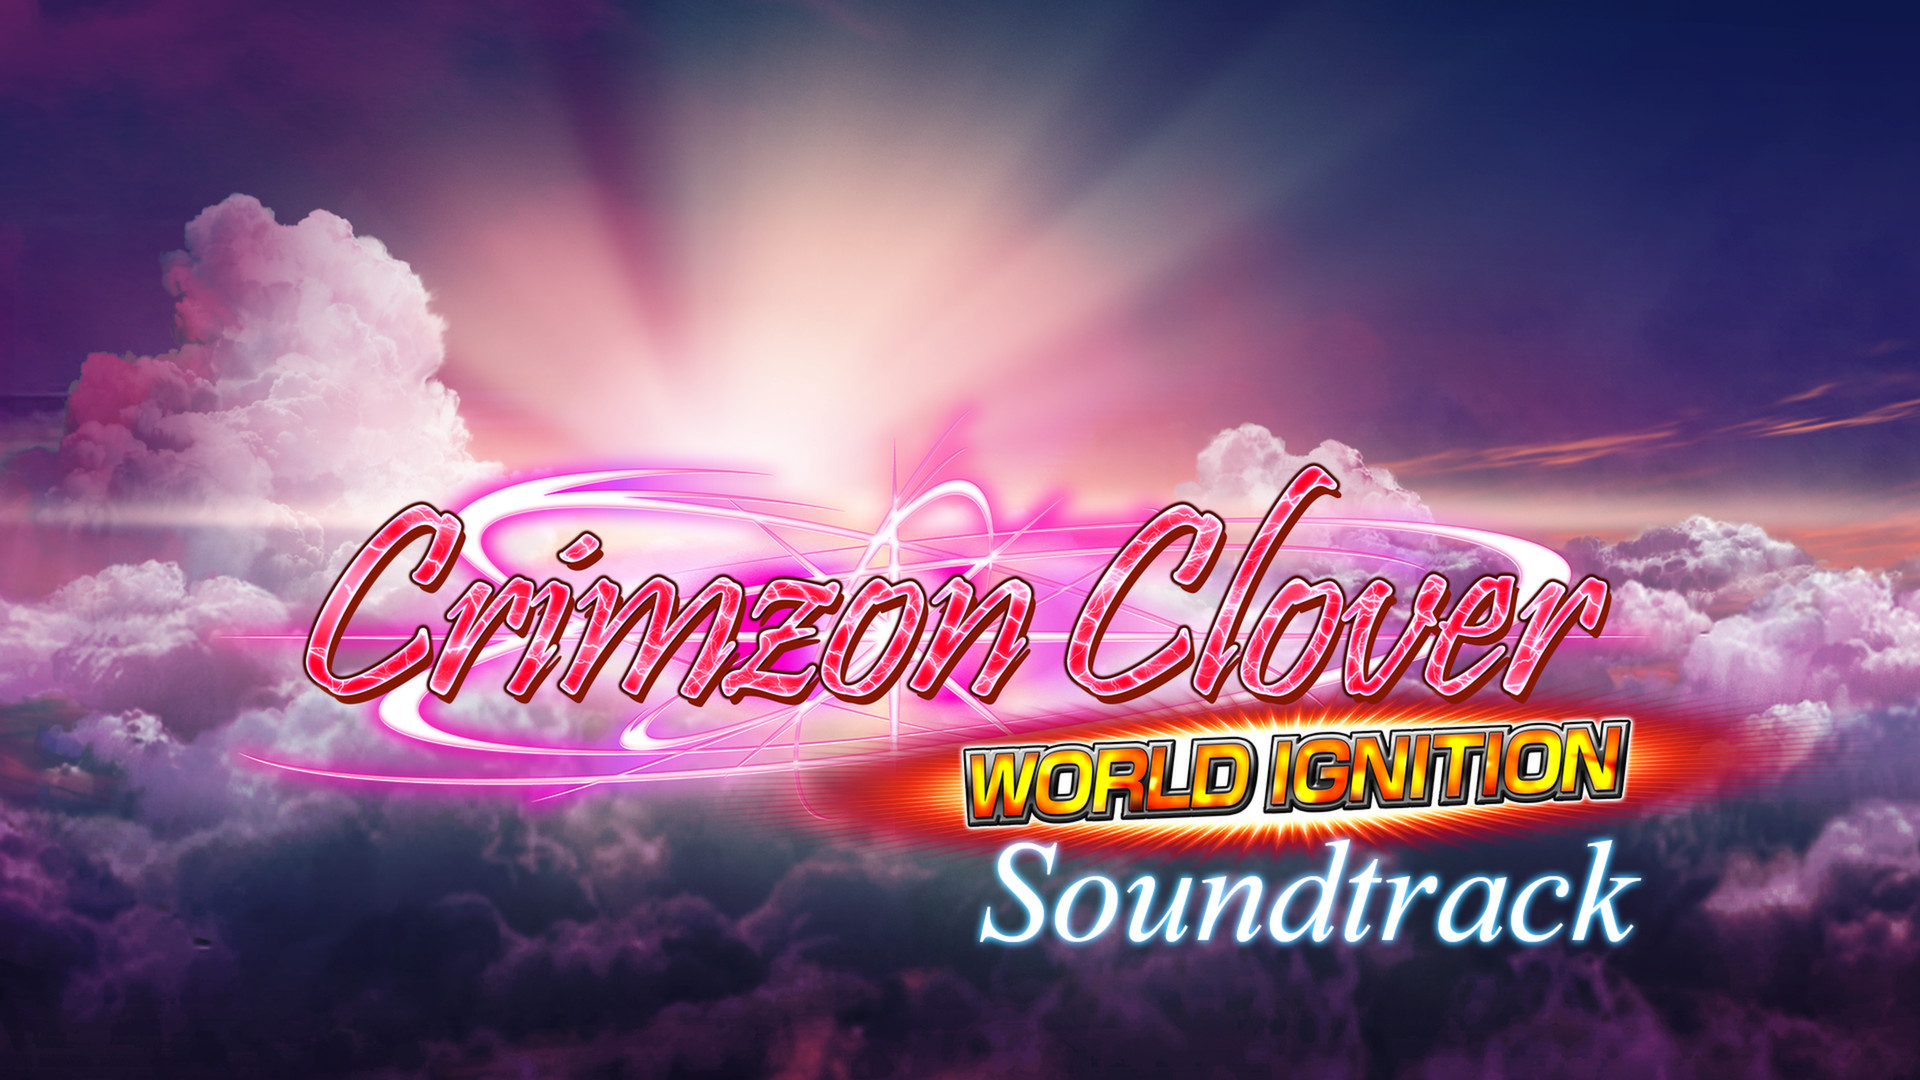 Crimzon Clover WORLD IGNITION - Soundtrack screenshot